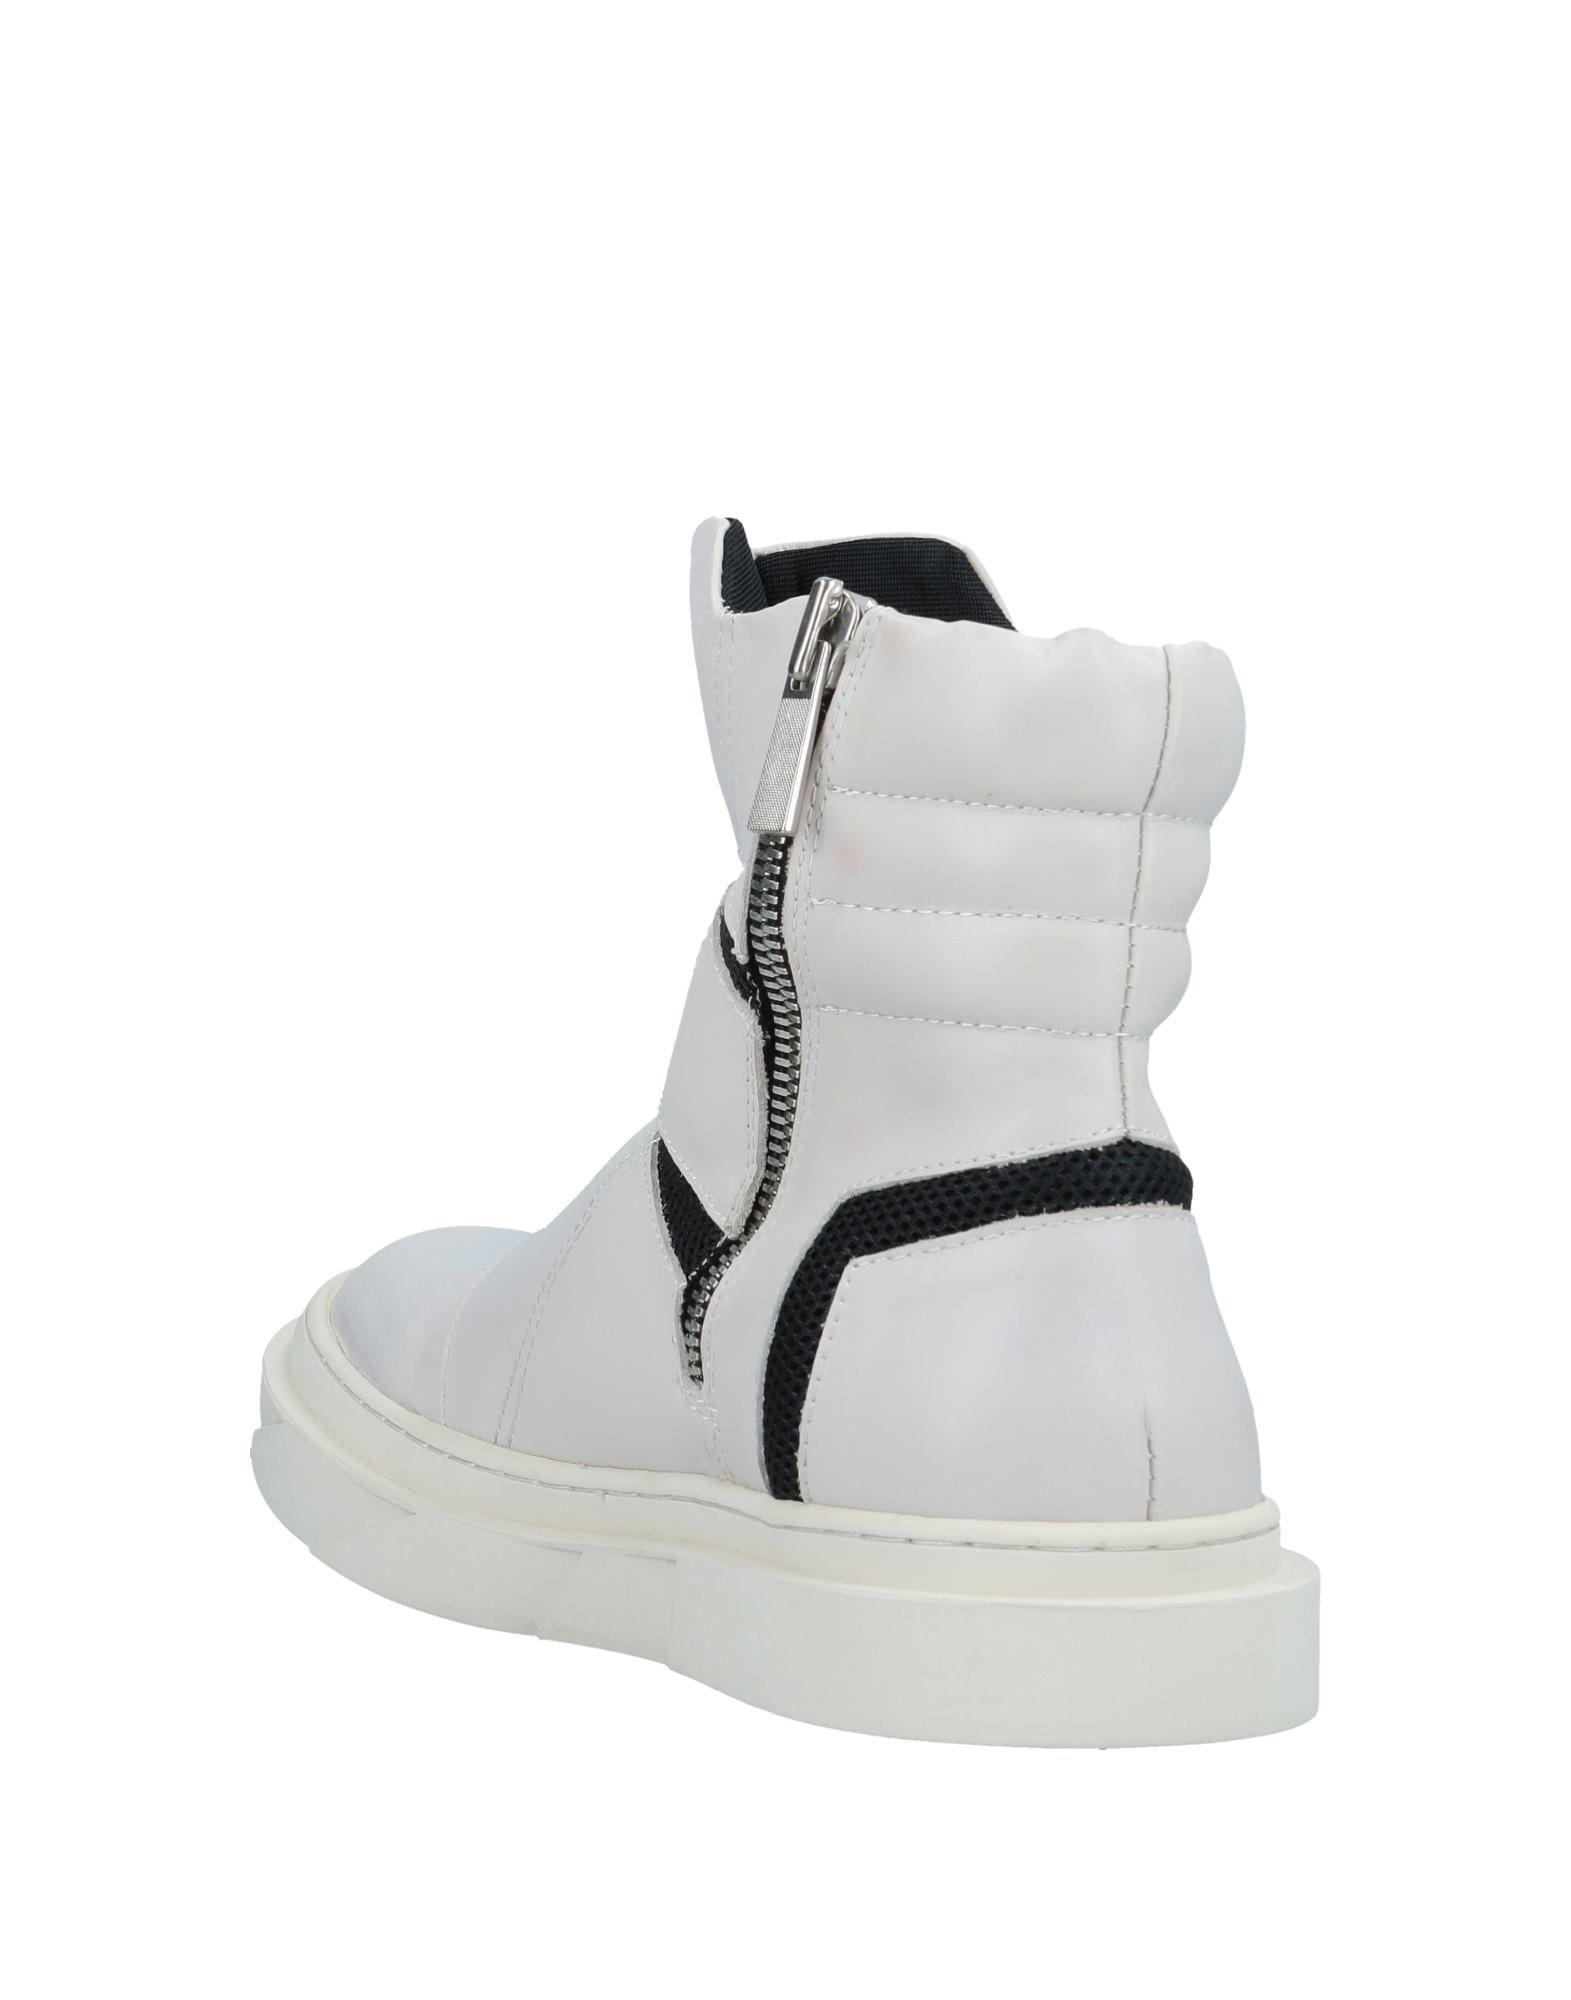 D.Gnak By D.Gnak Kang.D Sneakers - Men D.Gnak By By Kang.D Sneakers online on  Australia - 44977281QQ 359a9c